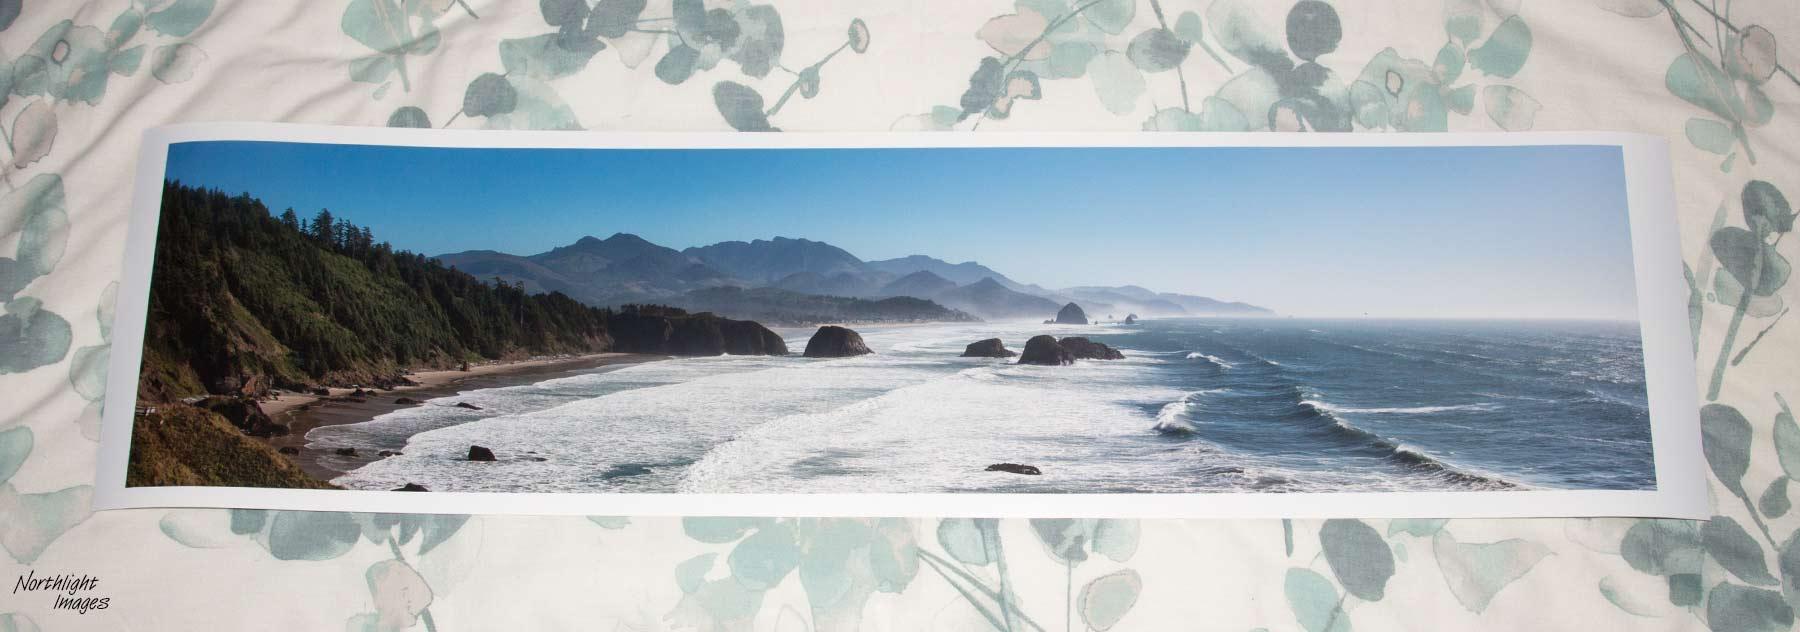 39-inch-panoramic-print